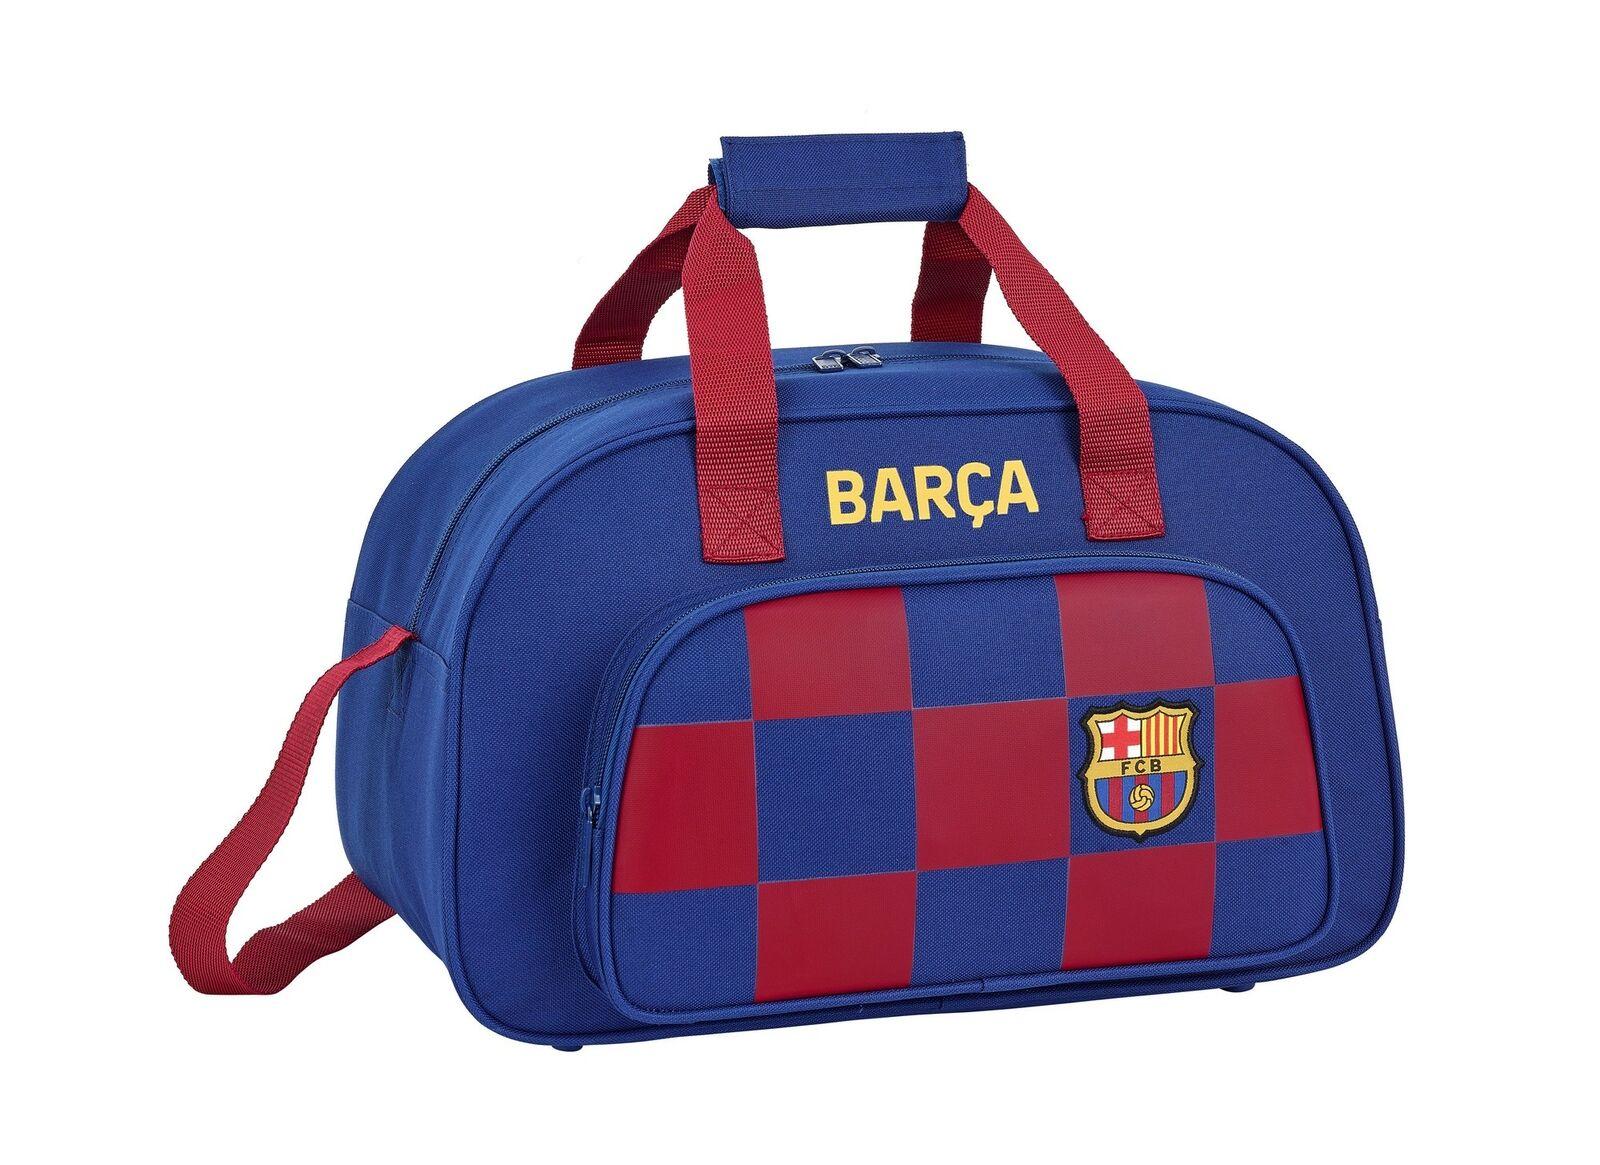 F.C Barcelona Travel Duffel Holdall Holiday Sports Bag 50cm Boys OFFICIAL